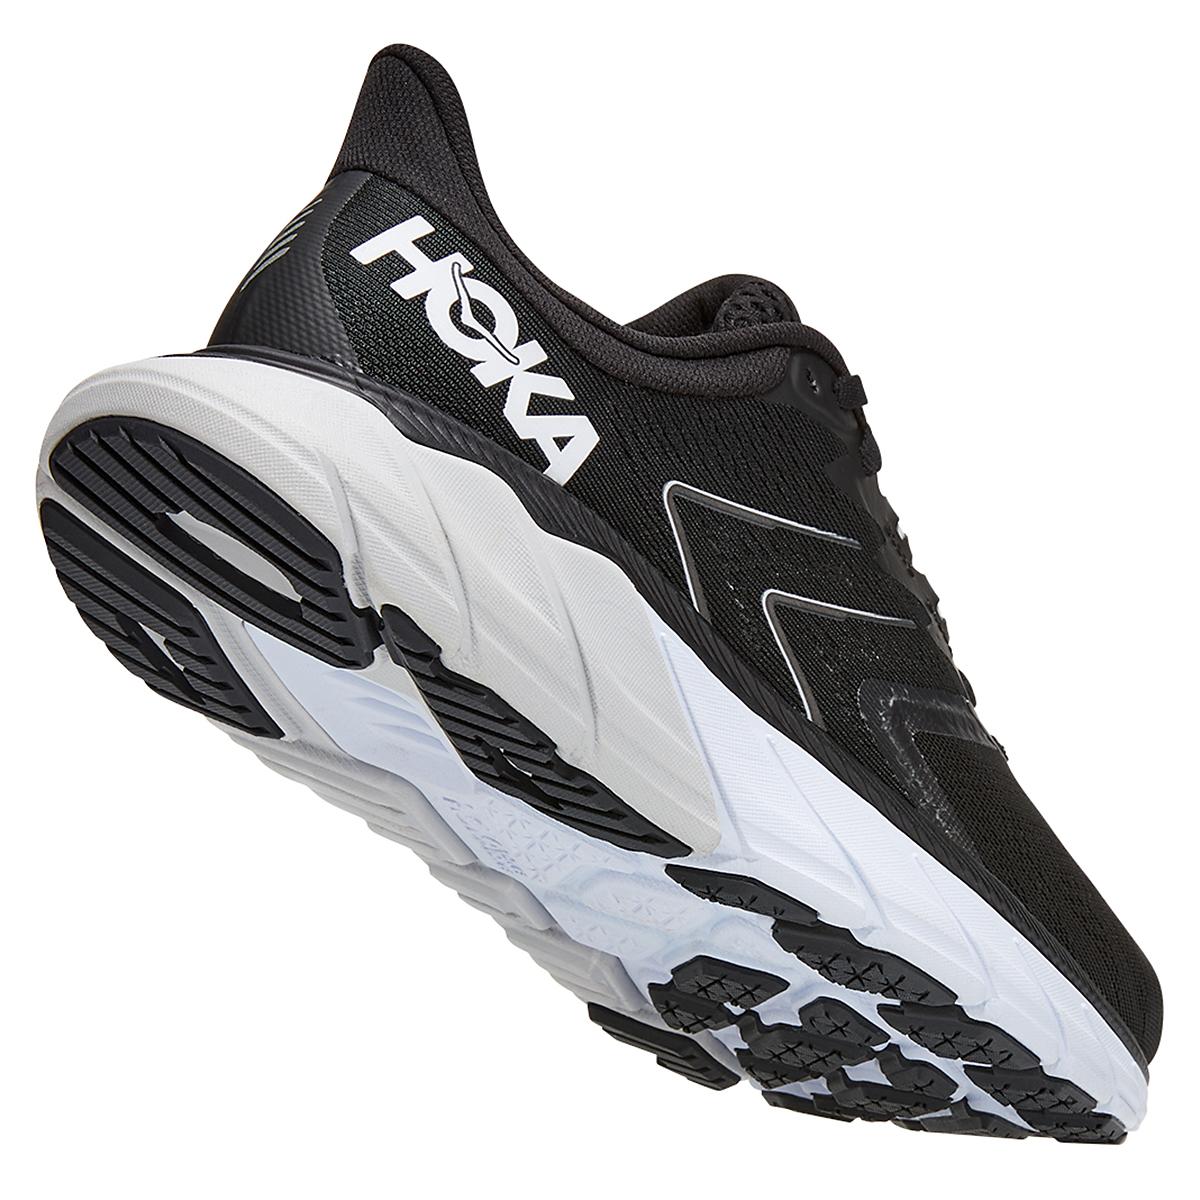 Women's Hoka One One Arahi 5 Running Shoe - Color: Black/White - Size: 5 - Width: Regular, Black/White, large, image 2